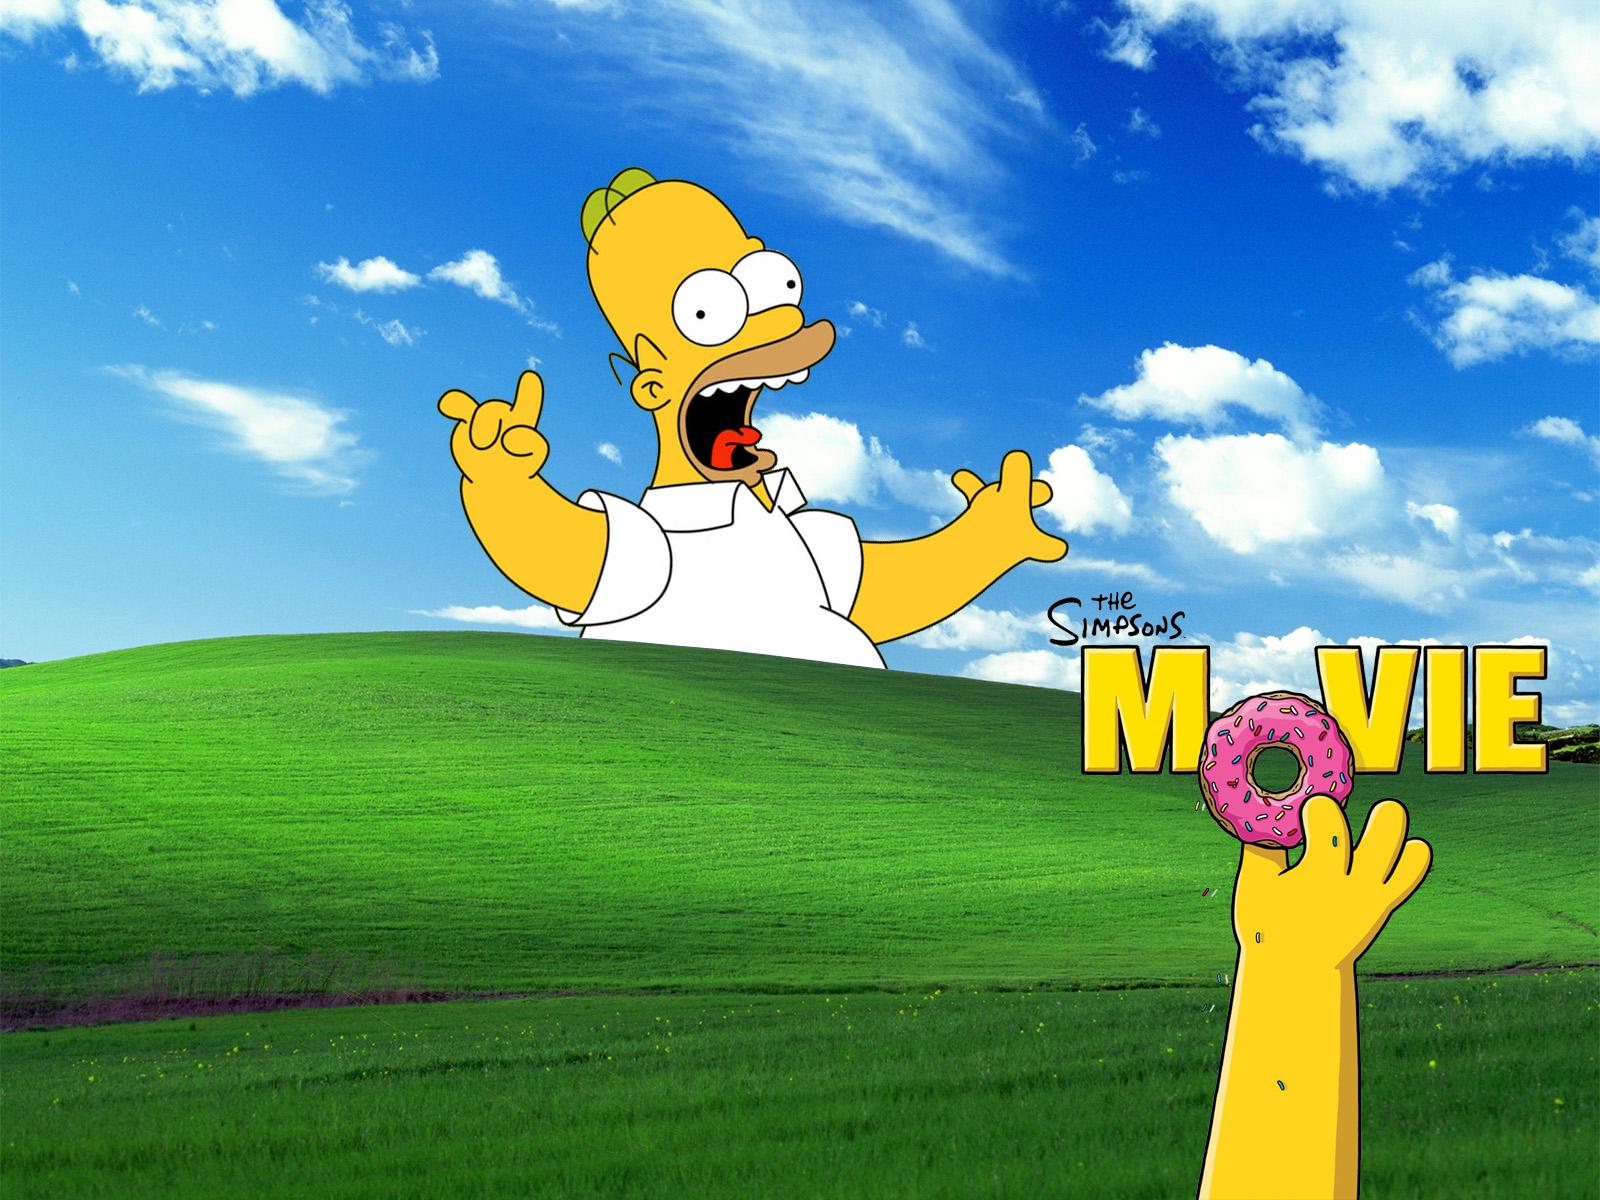 The Simpsons Movie Wallpaper by Mumtazzaidi on DeviantArt